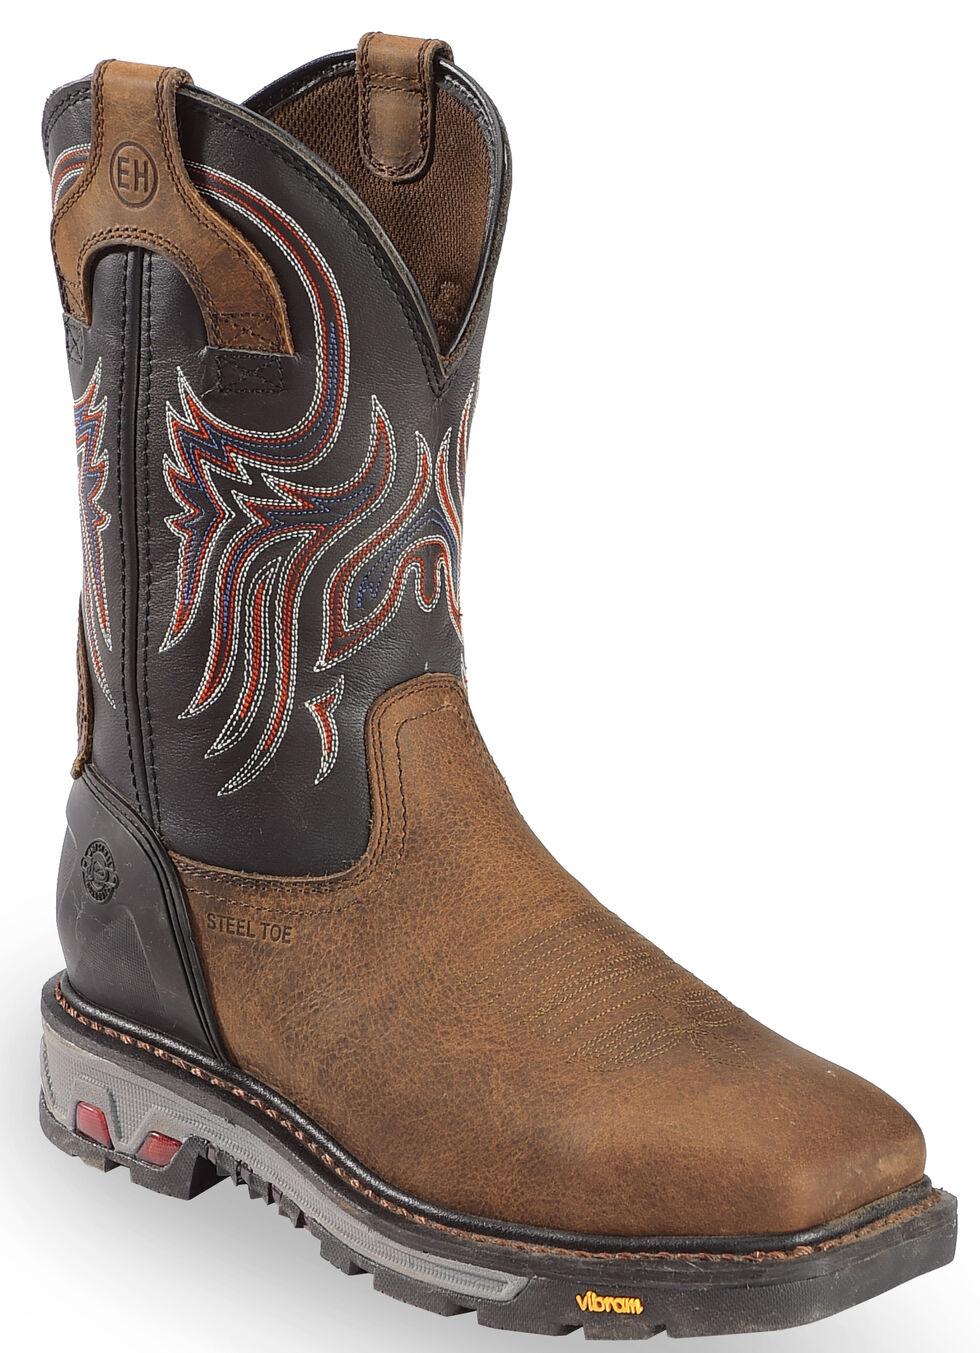 Justin Men's Tanker Black EH Waterproof Work Boots - Steel Toe, Timber, hi-res